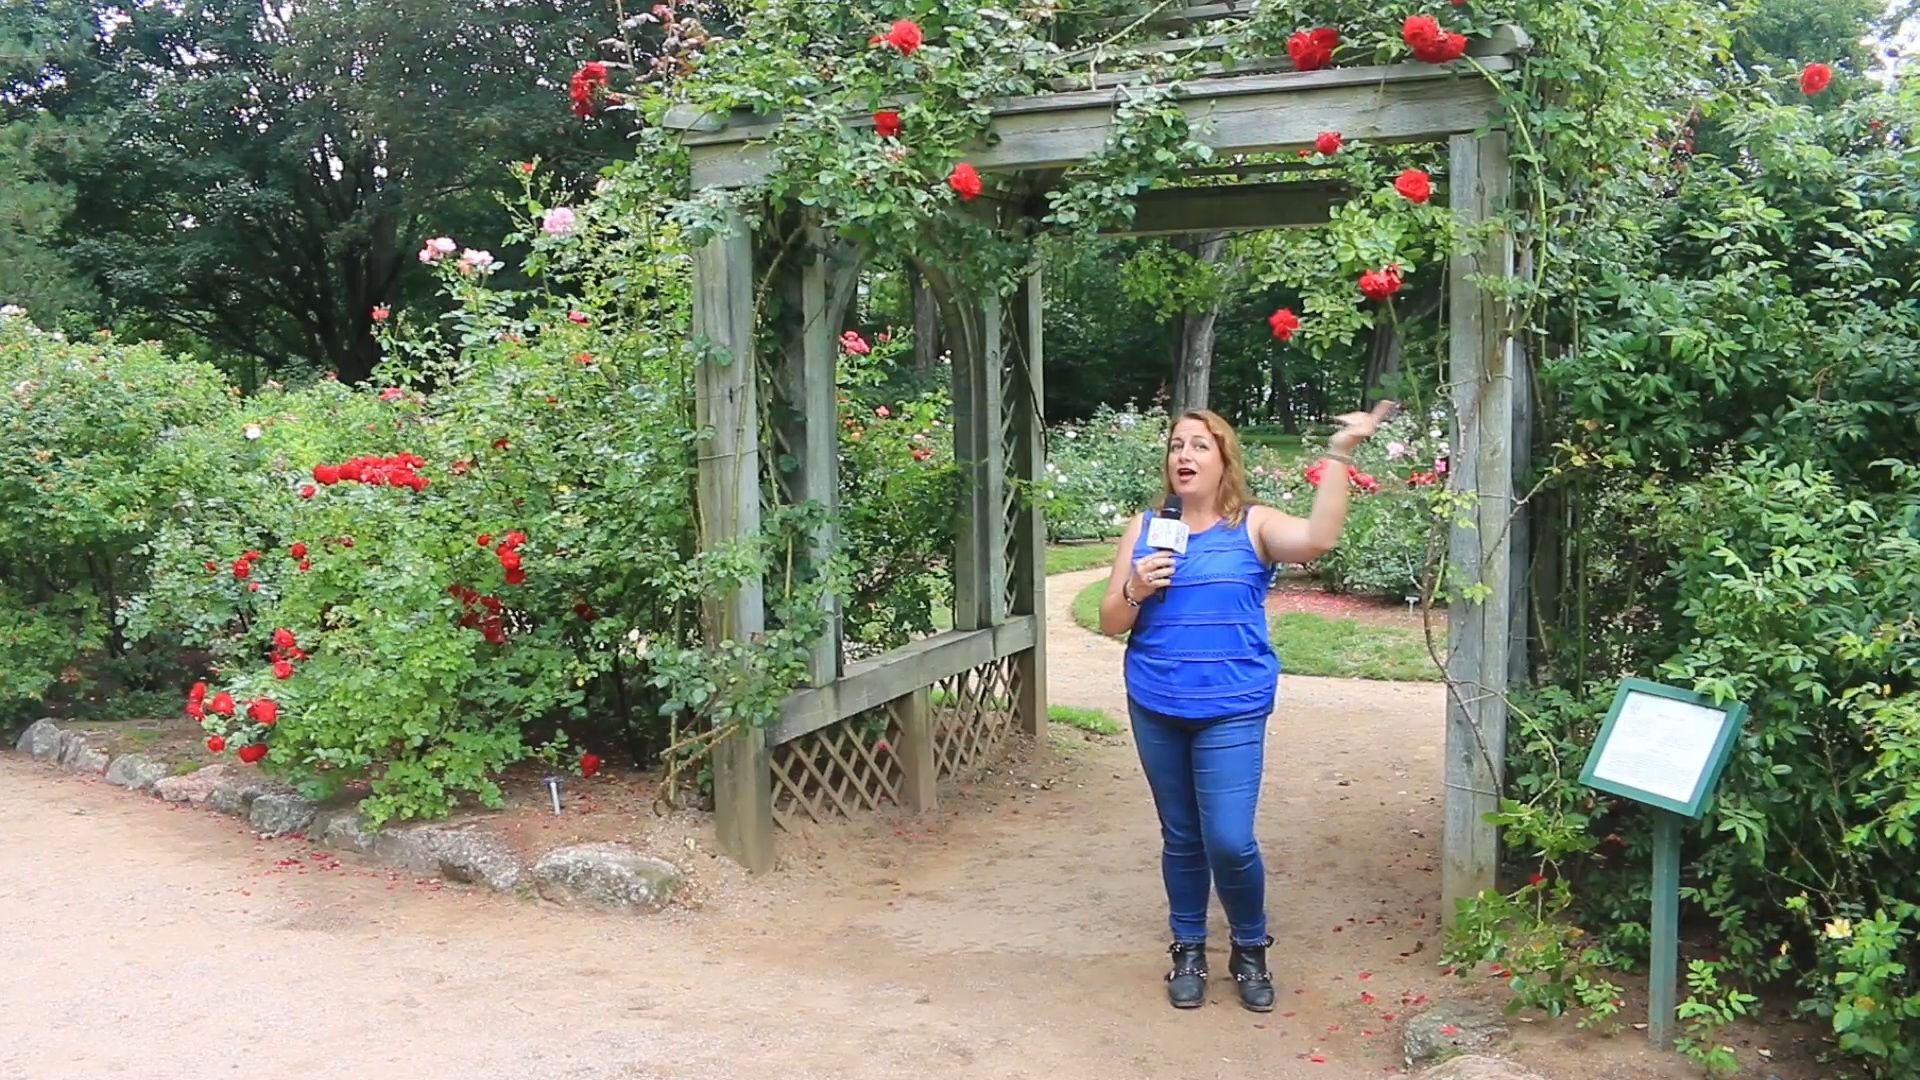 Nova Scotia Travel Special: Annapolis Royal Historic Gardens